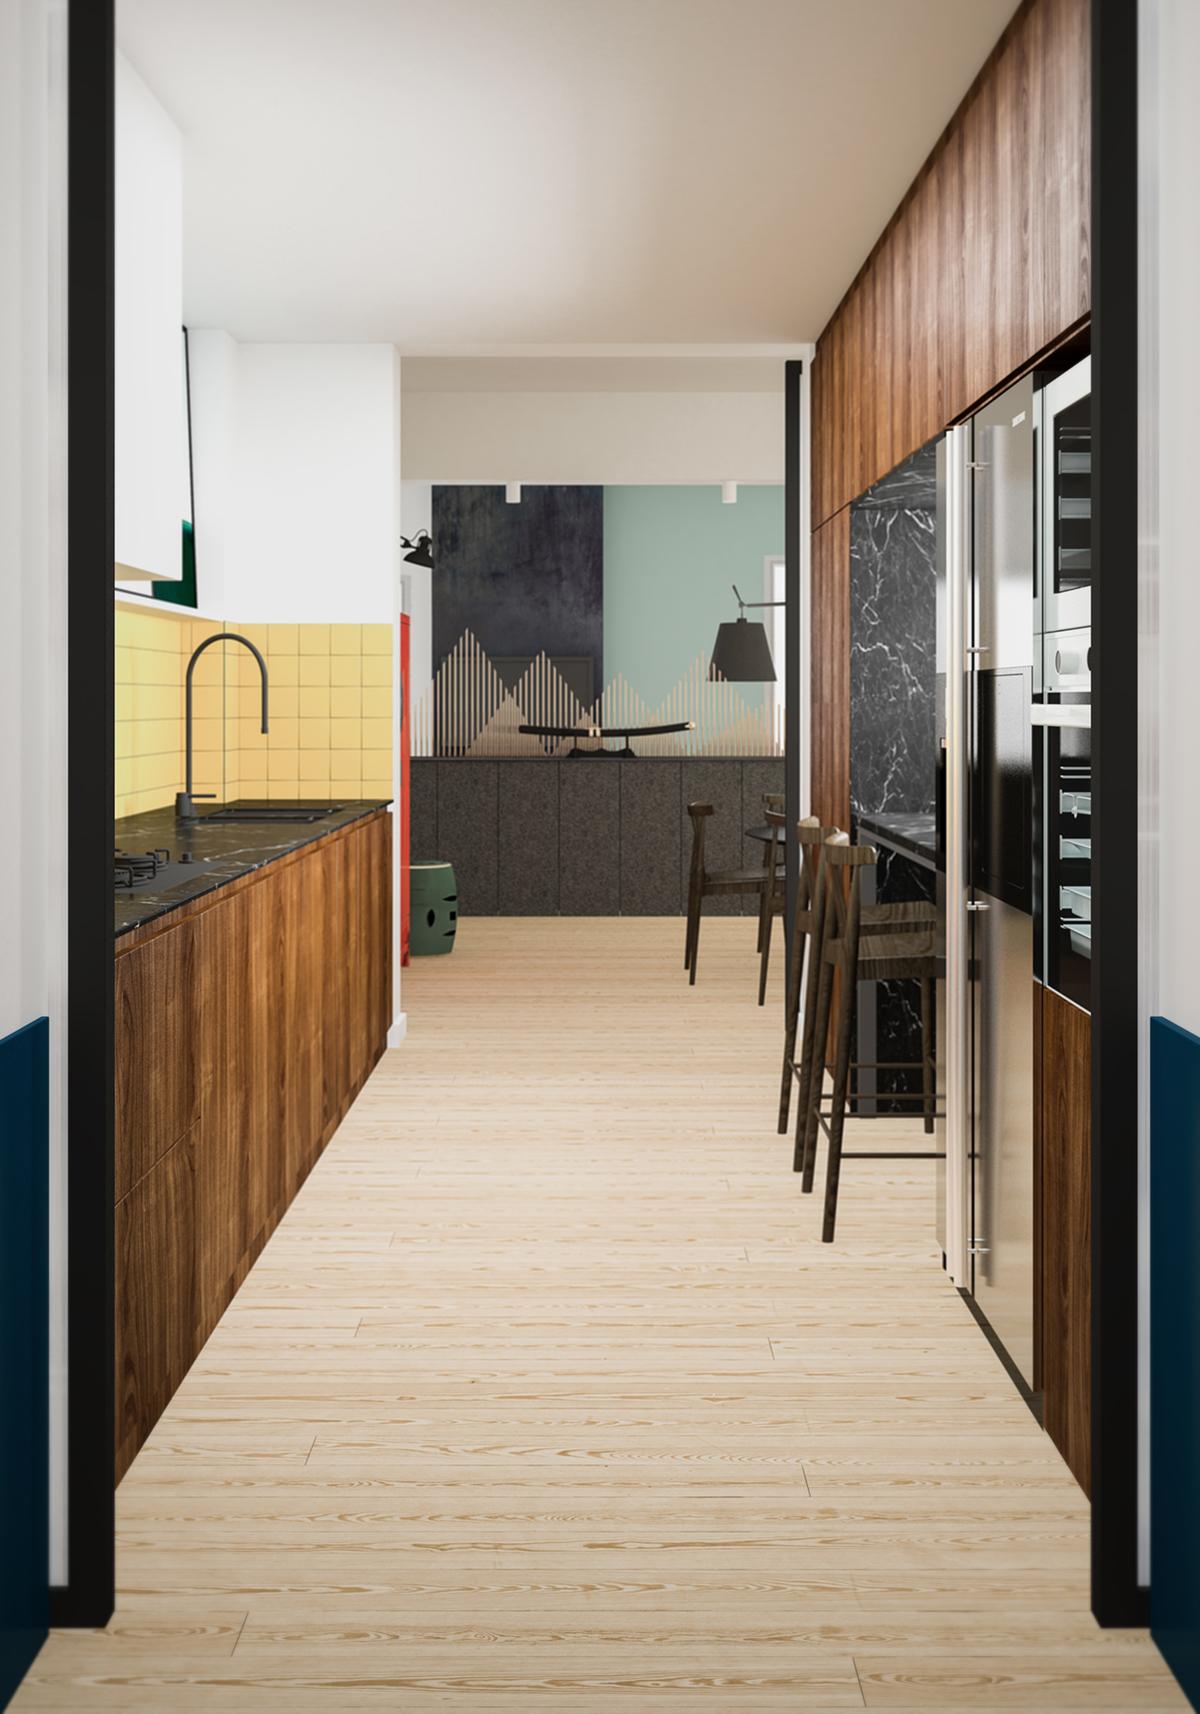 cocina-casa-gato-vivienda-valencia-diseño-tiovivo